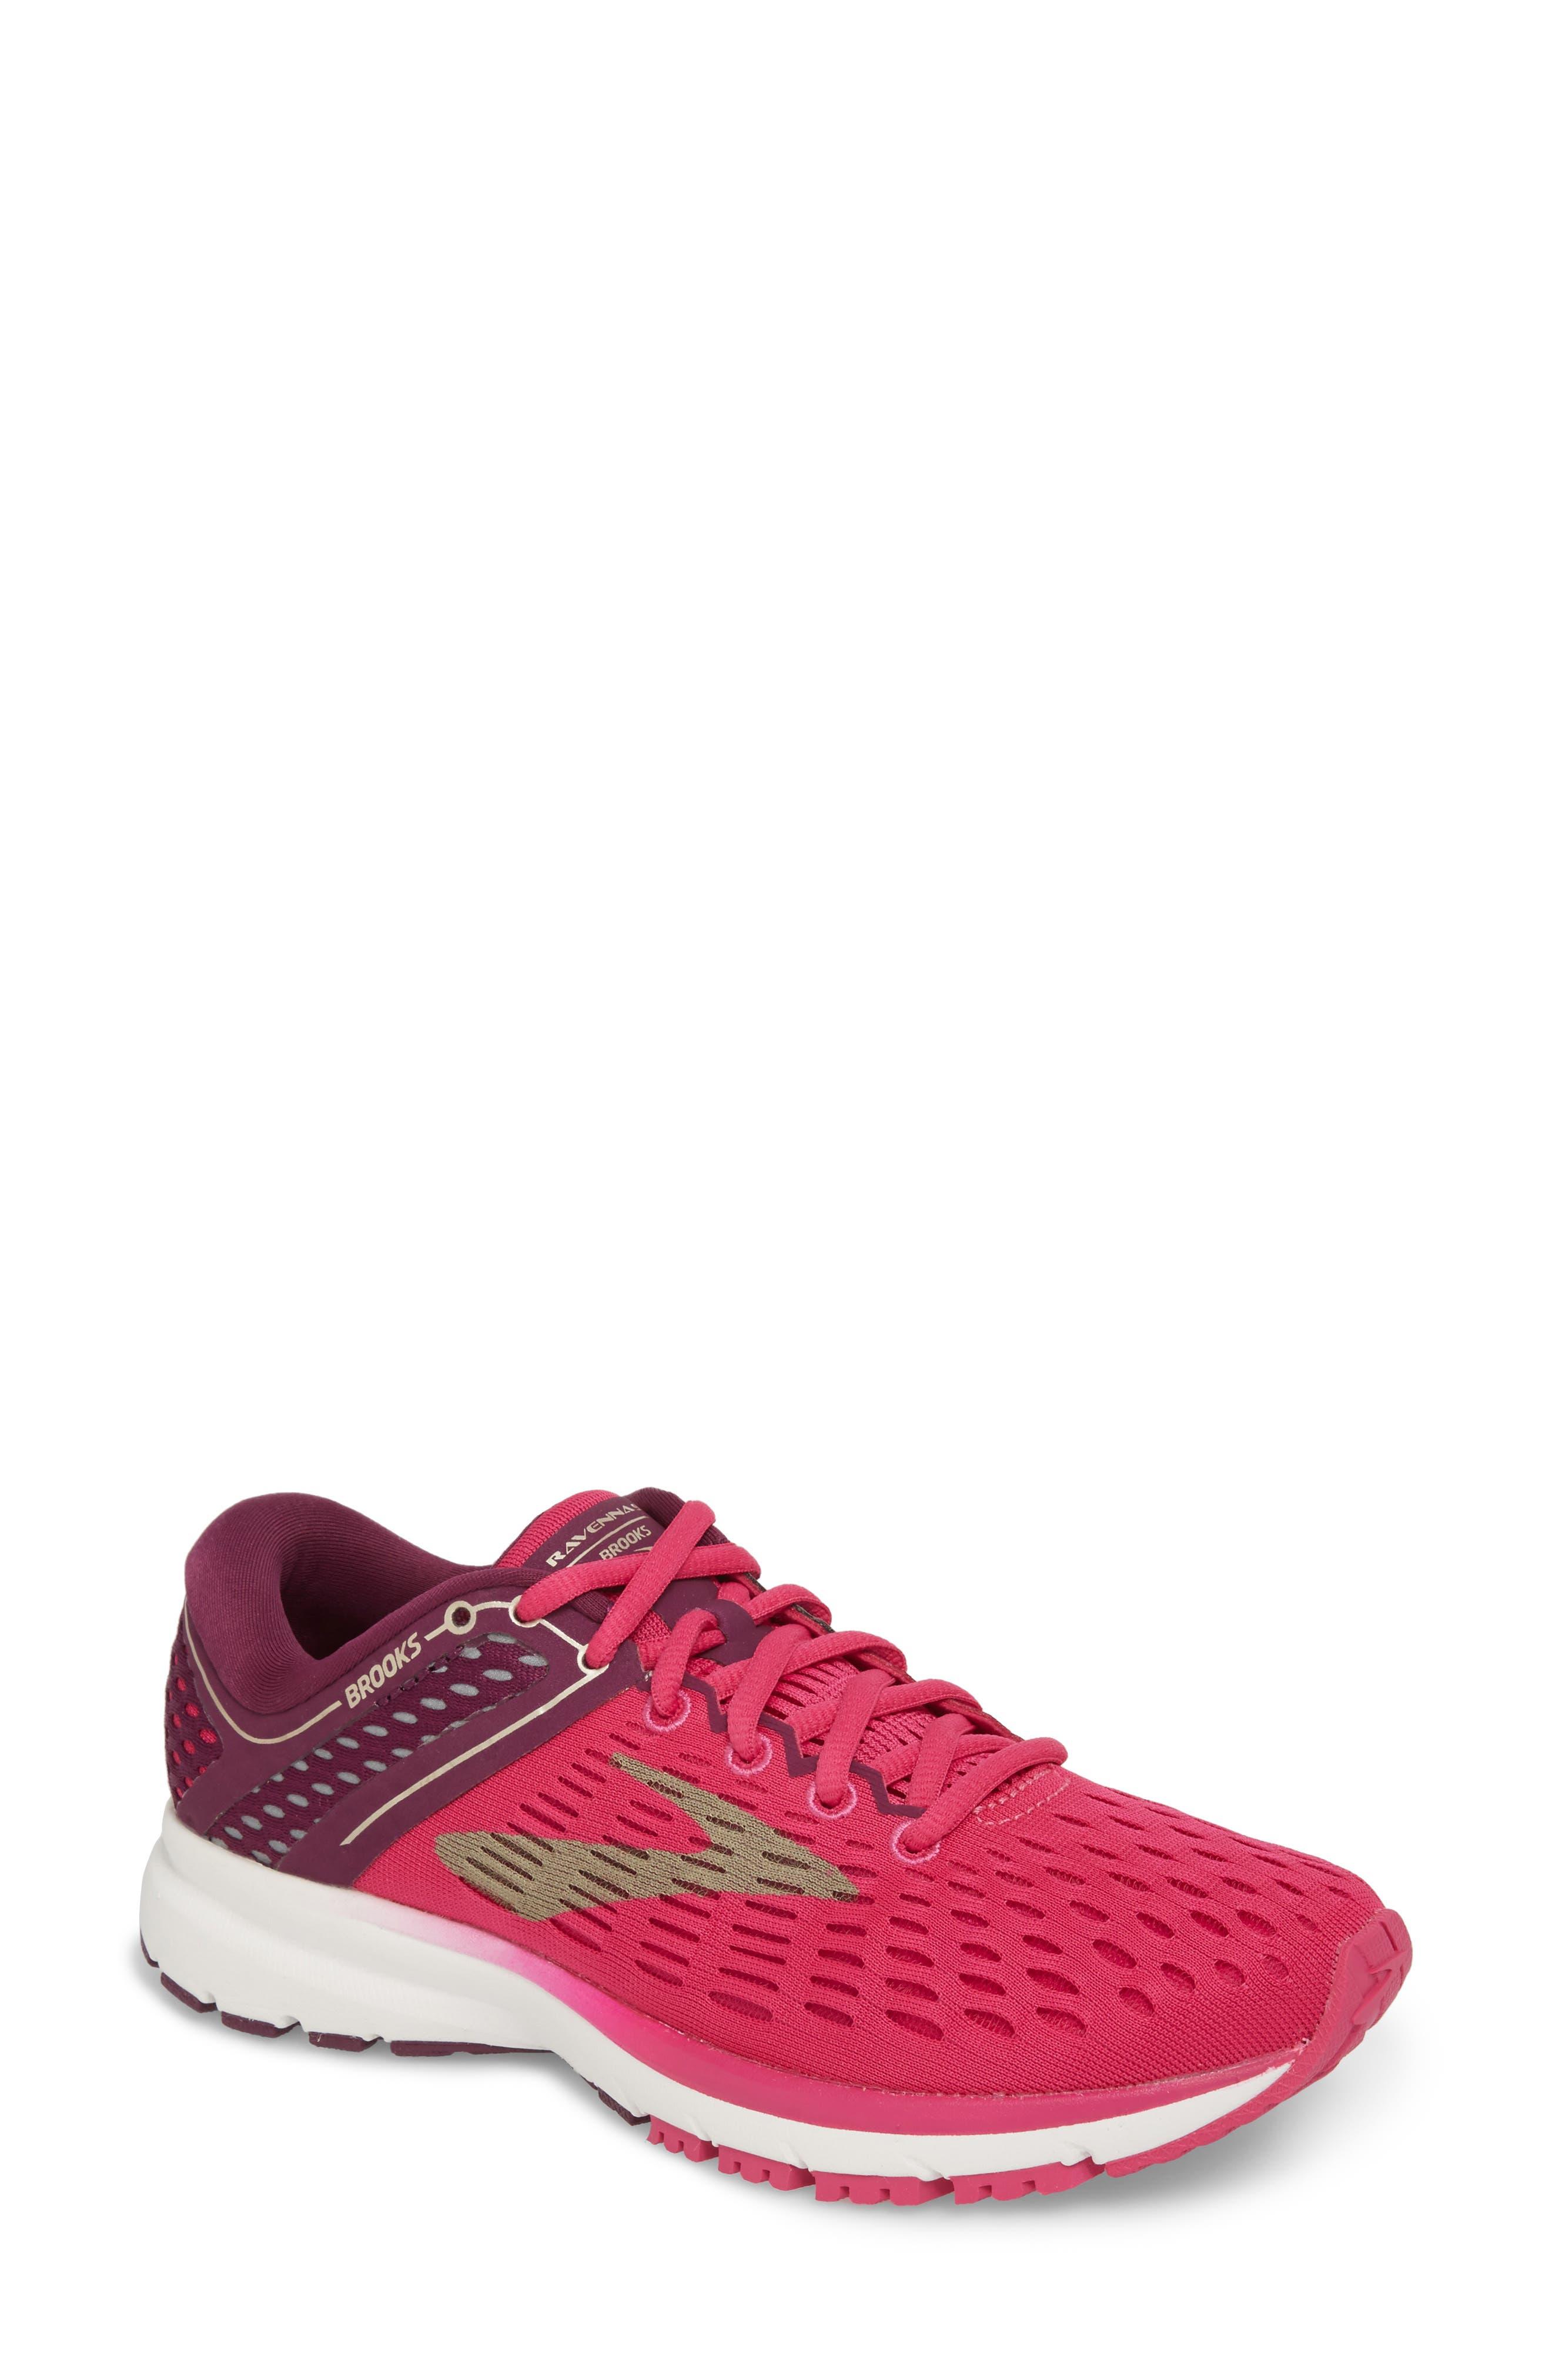 Ravenna 9 Running Shoe,                         Main,                         color, Pink/ Plum/ Champagne